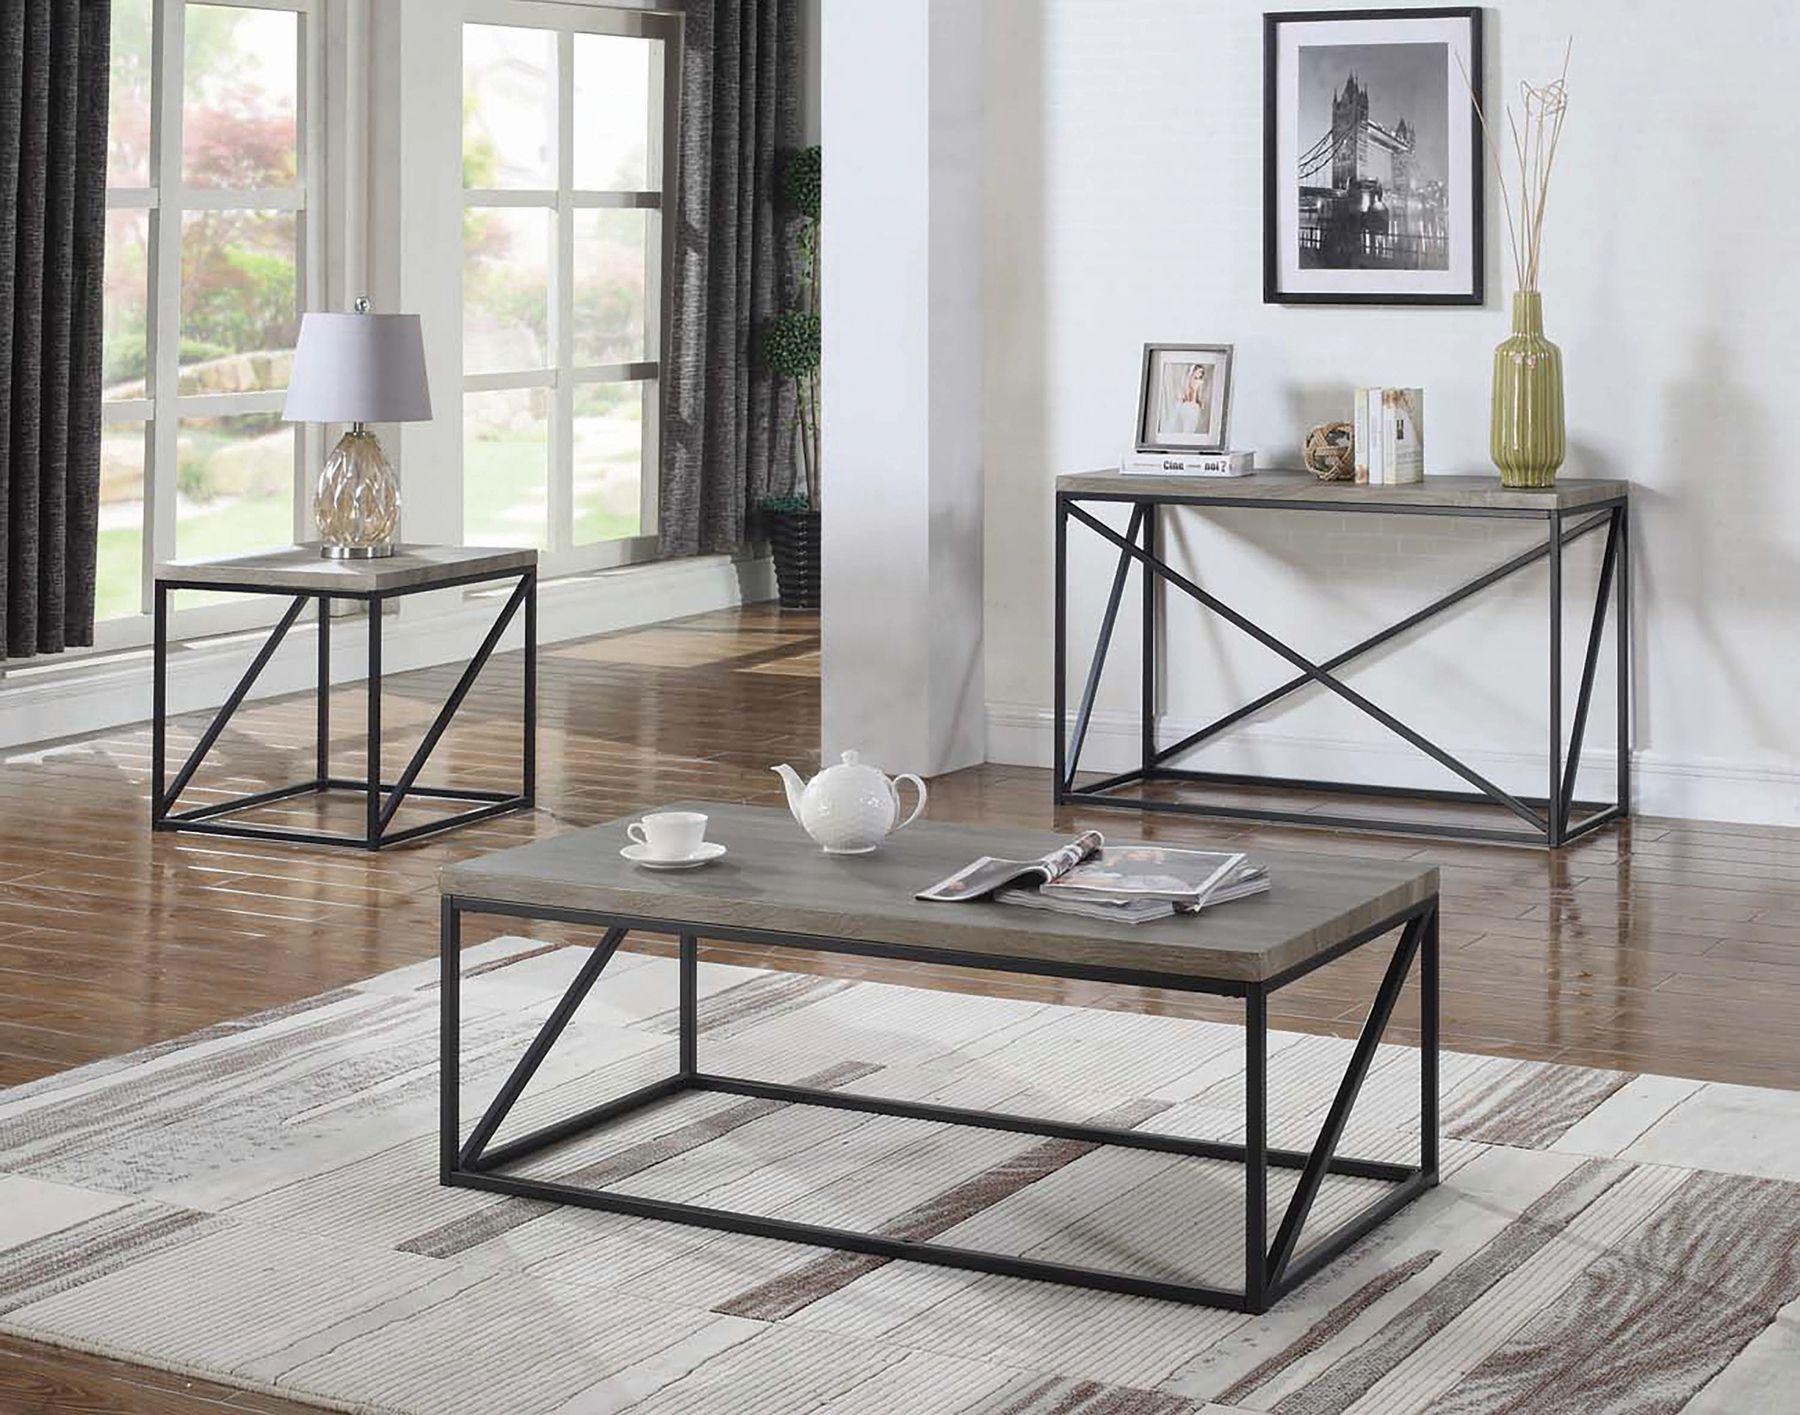 Cs618 Coffee Table 705618 Coaster Furniture Coffee Tables In 2021 Coffee Table Rectangle Coffee Table 3 Piece Coffee Table Set [ 1415 x 1800 Pixel ]